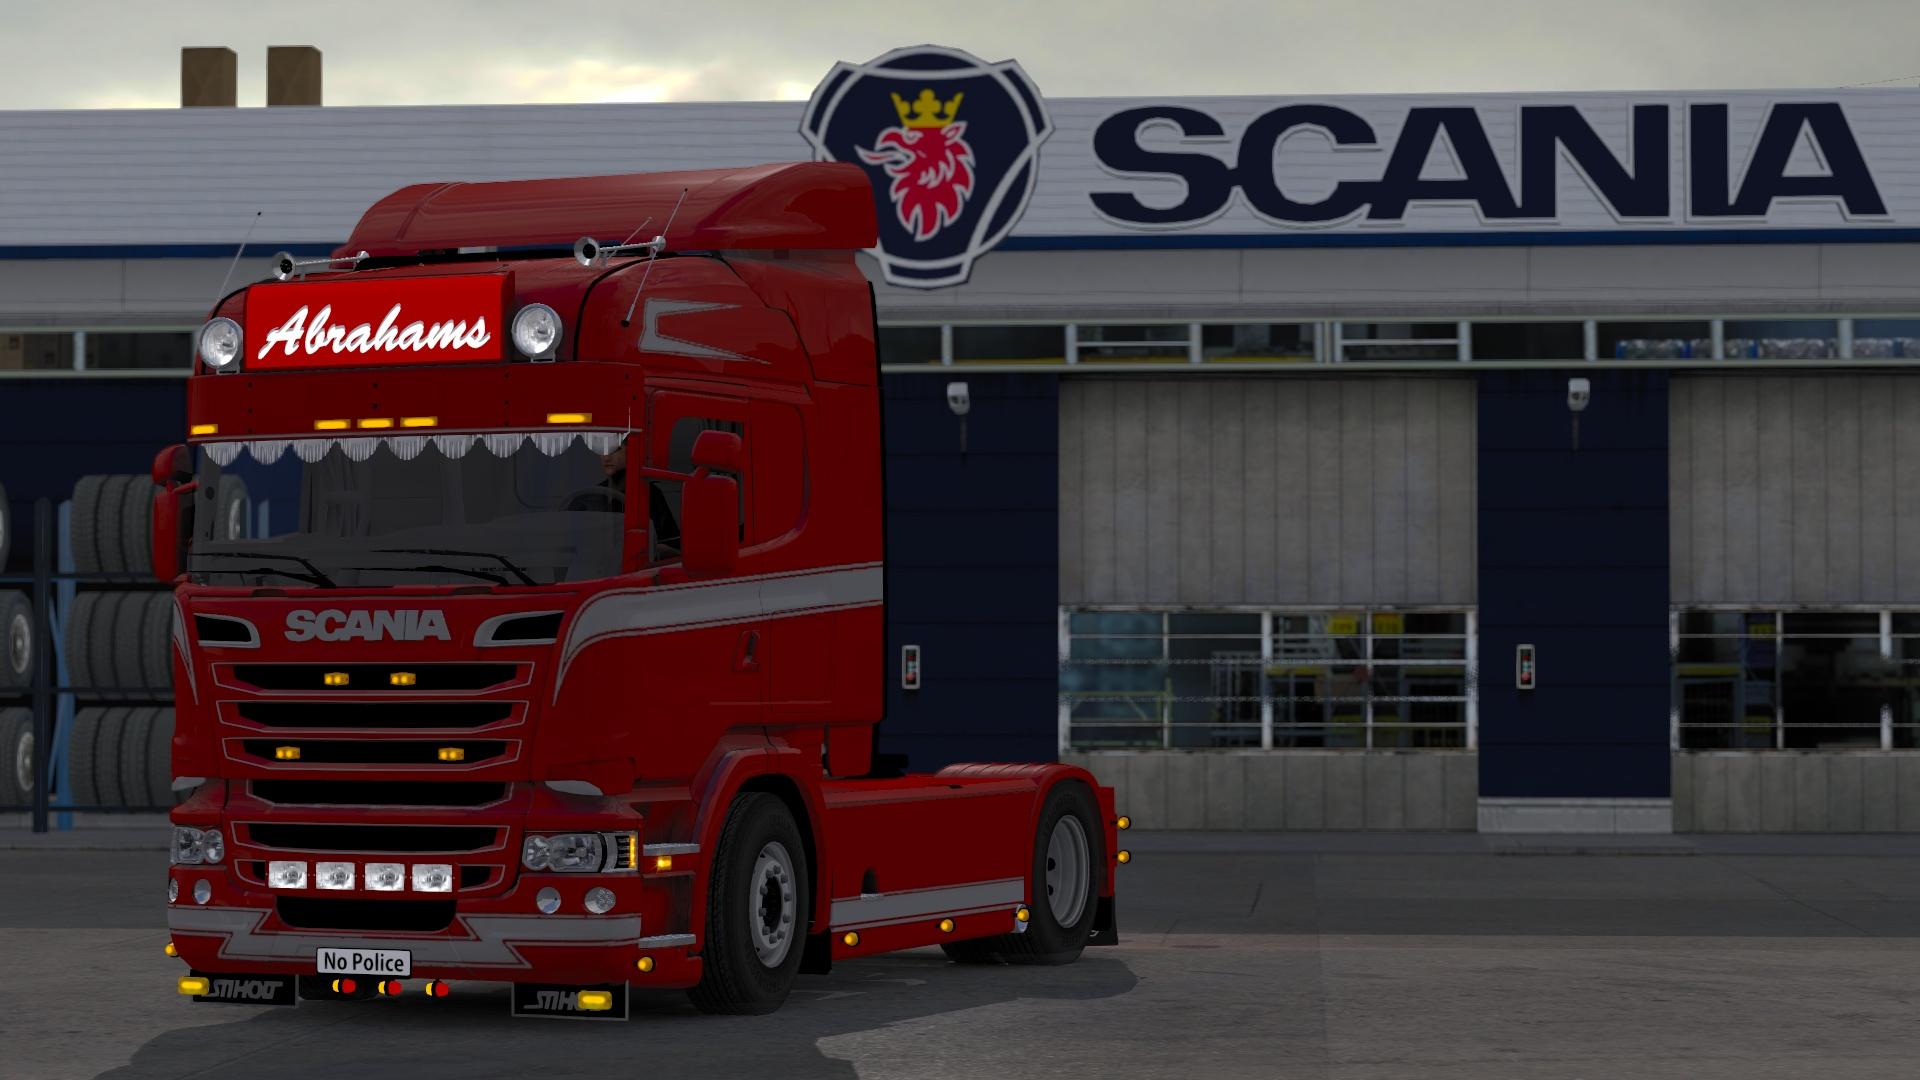 Scania Abrahams